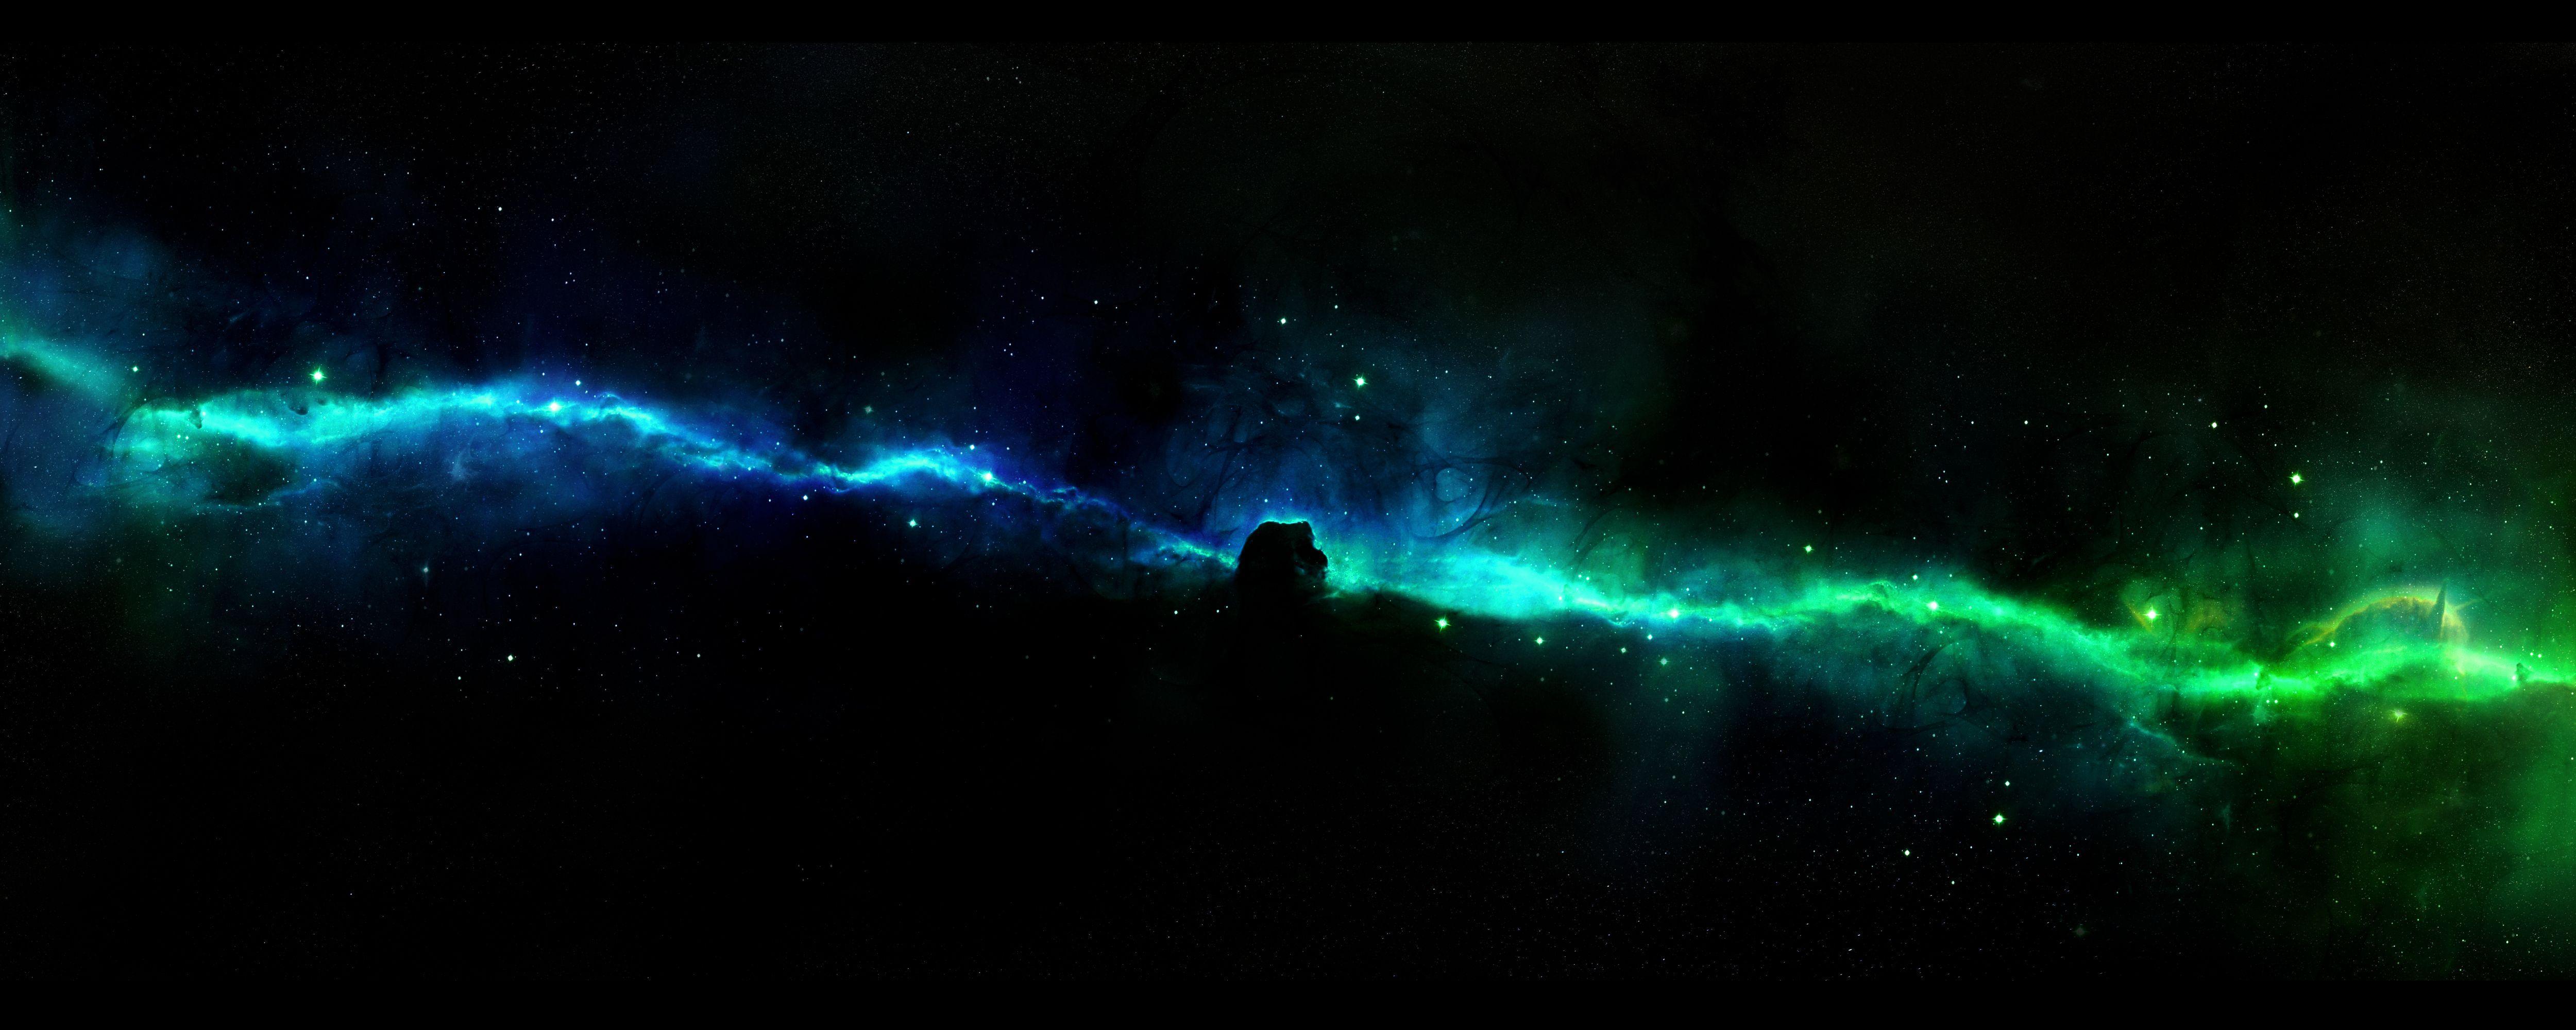 4k Space Wallpaper: 16K Ultra HD Space Wallpapers